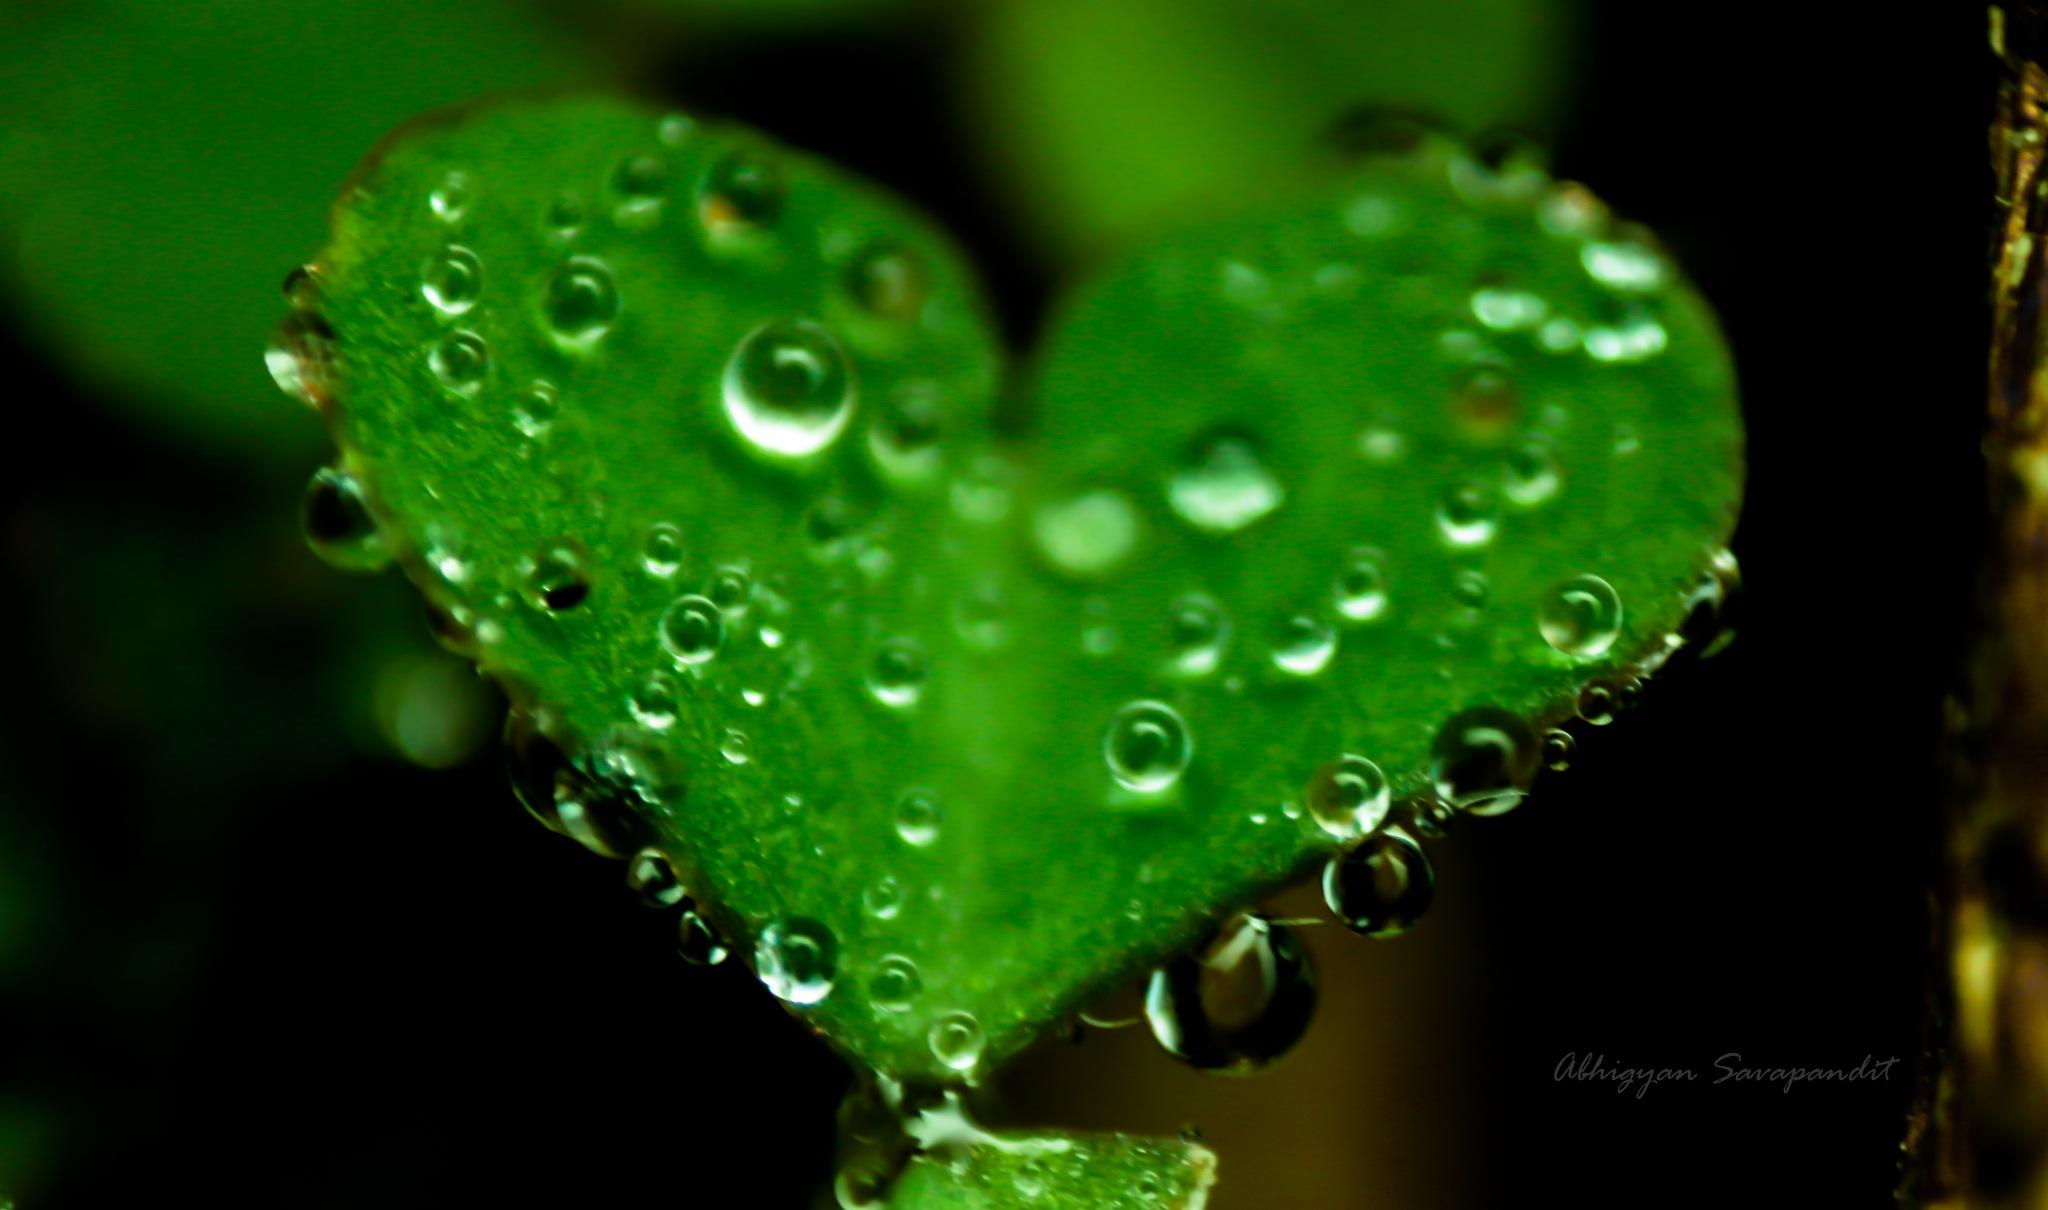 dew drops of spring by AbhigyanSavapandit